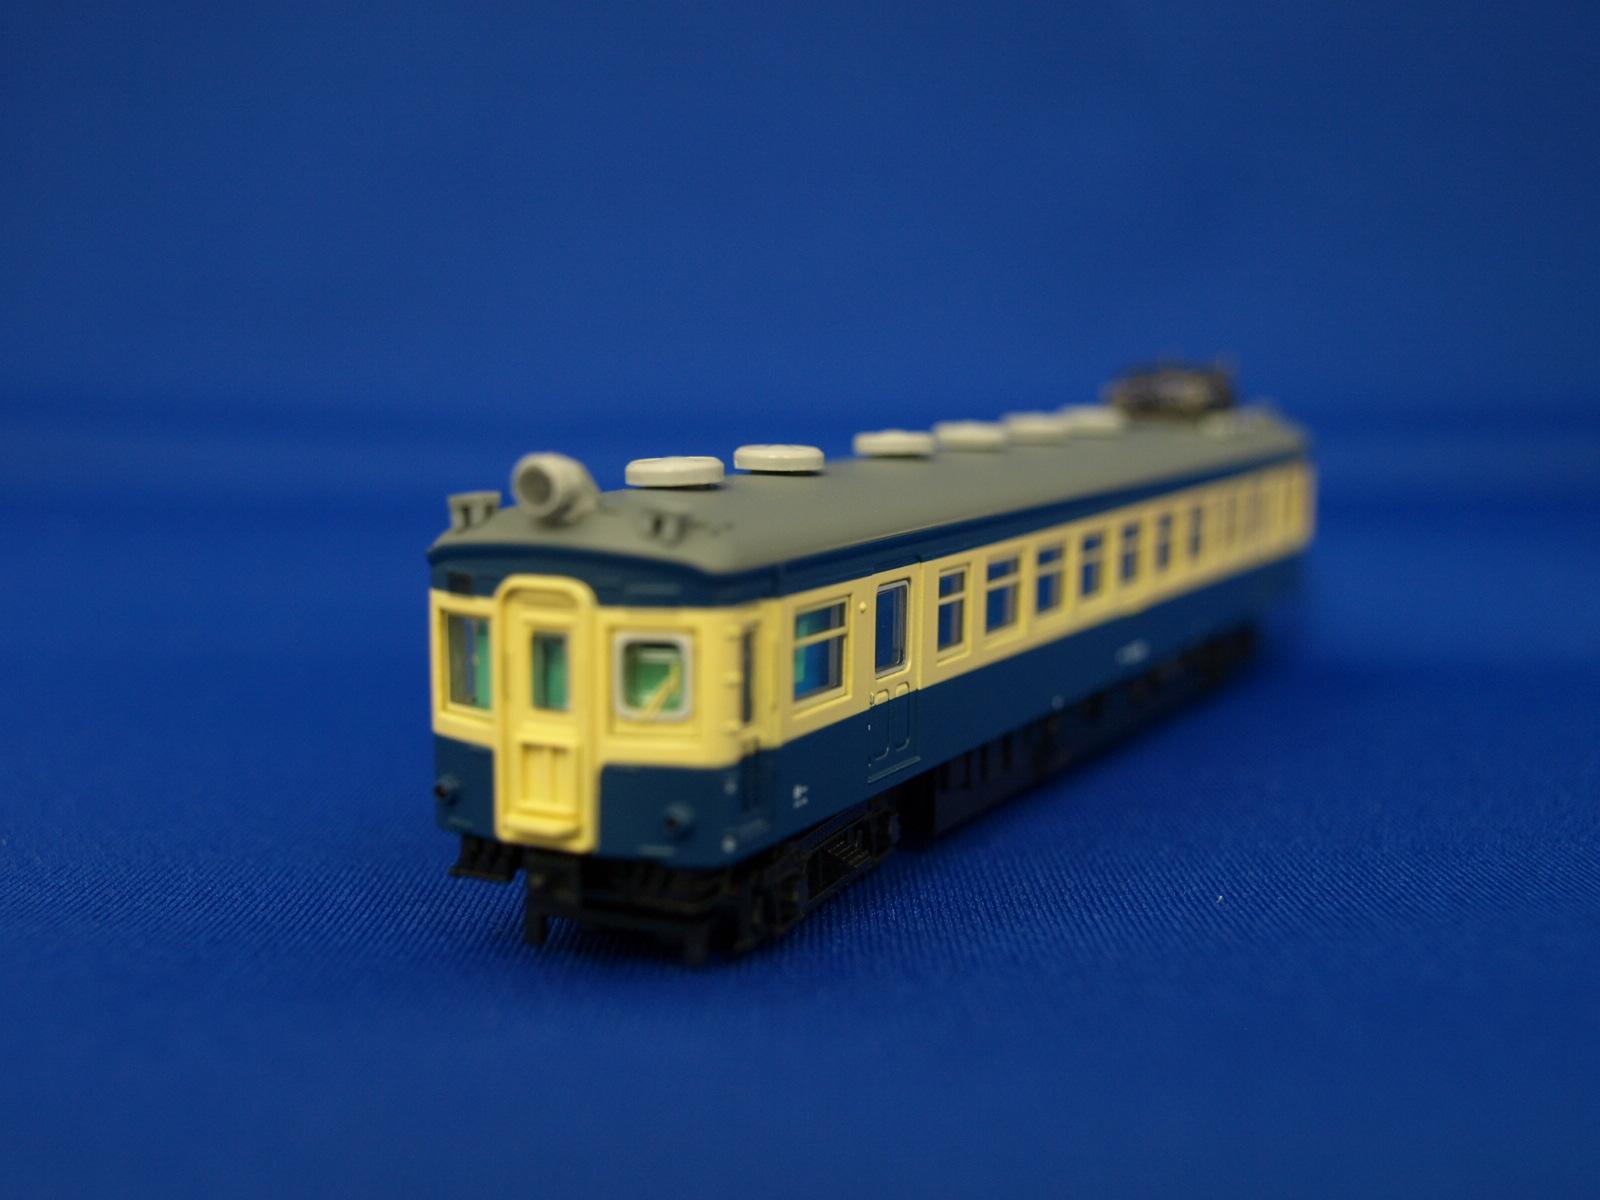 Nゲージ マイクロエース A1289  国鉄モハ43系+54系 スカ色 飯田線「さようならゲタ電」号 4両セット